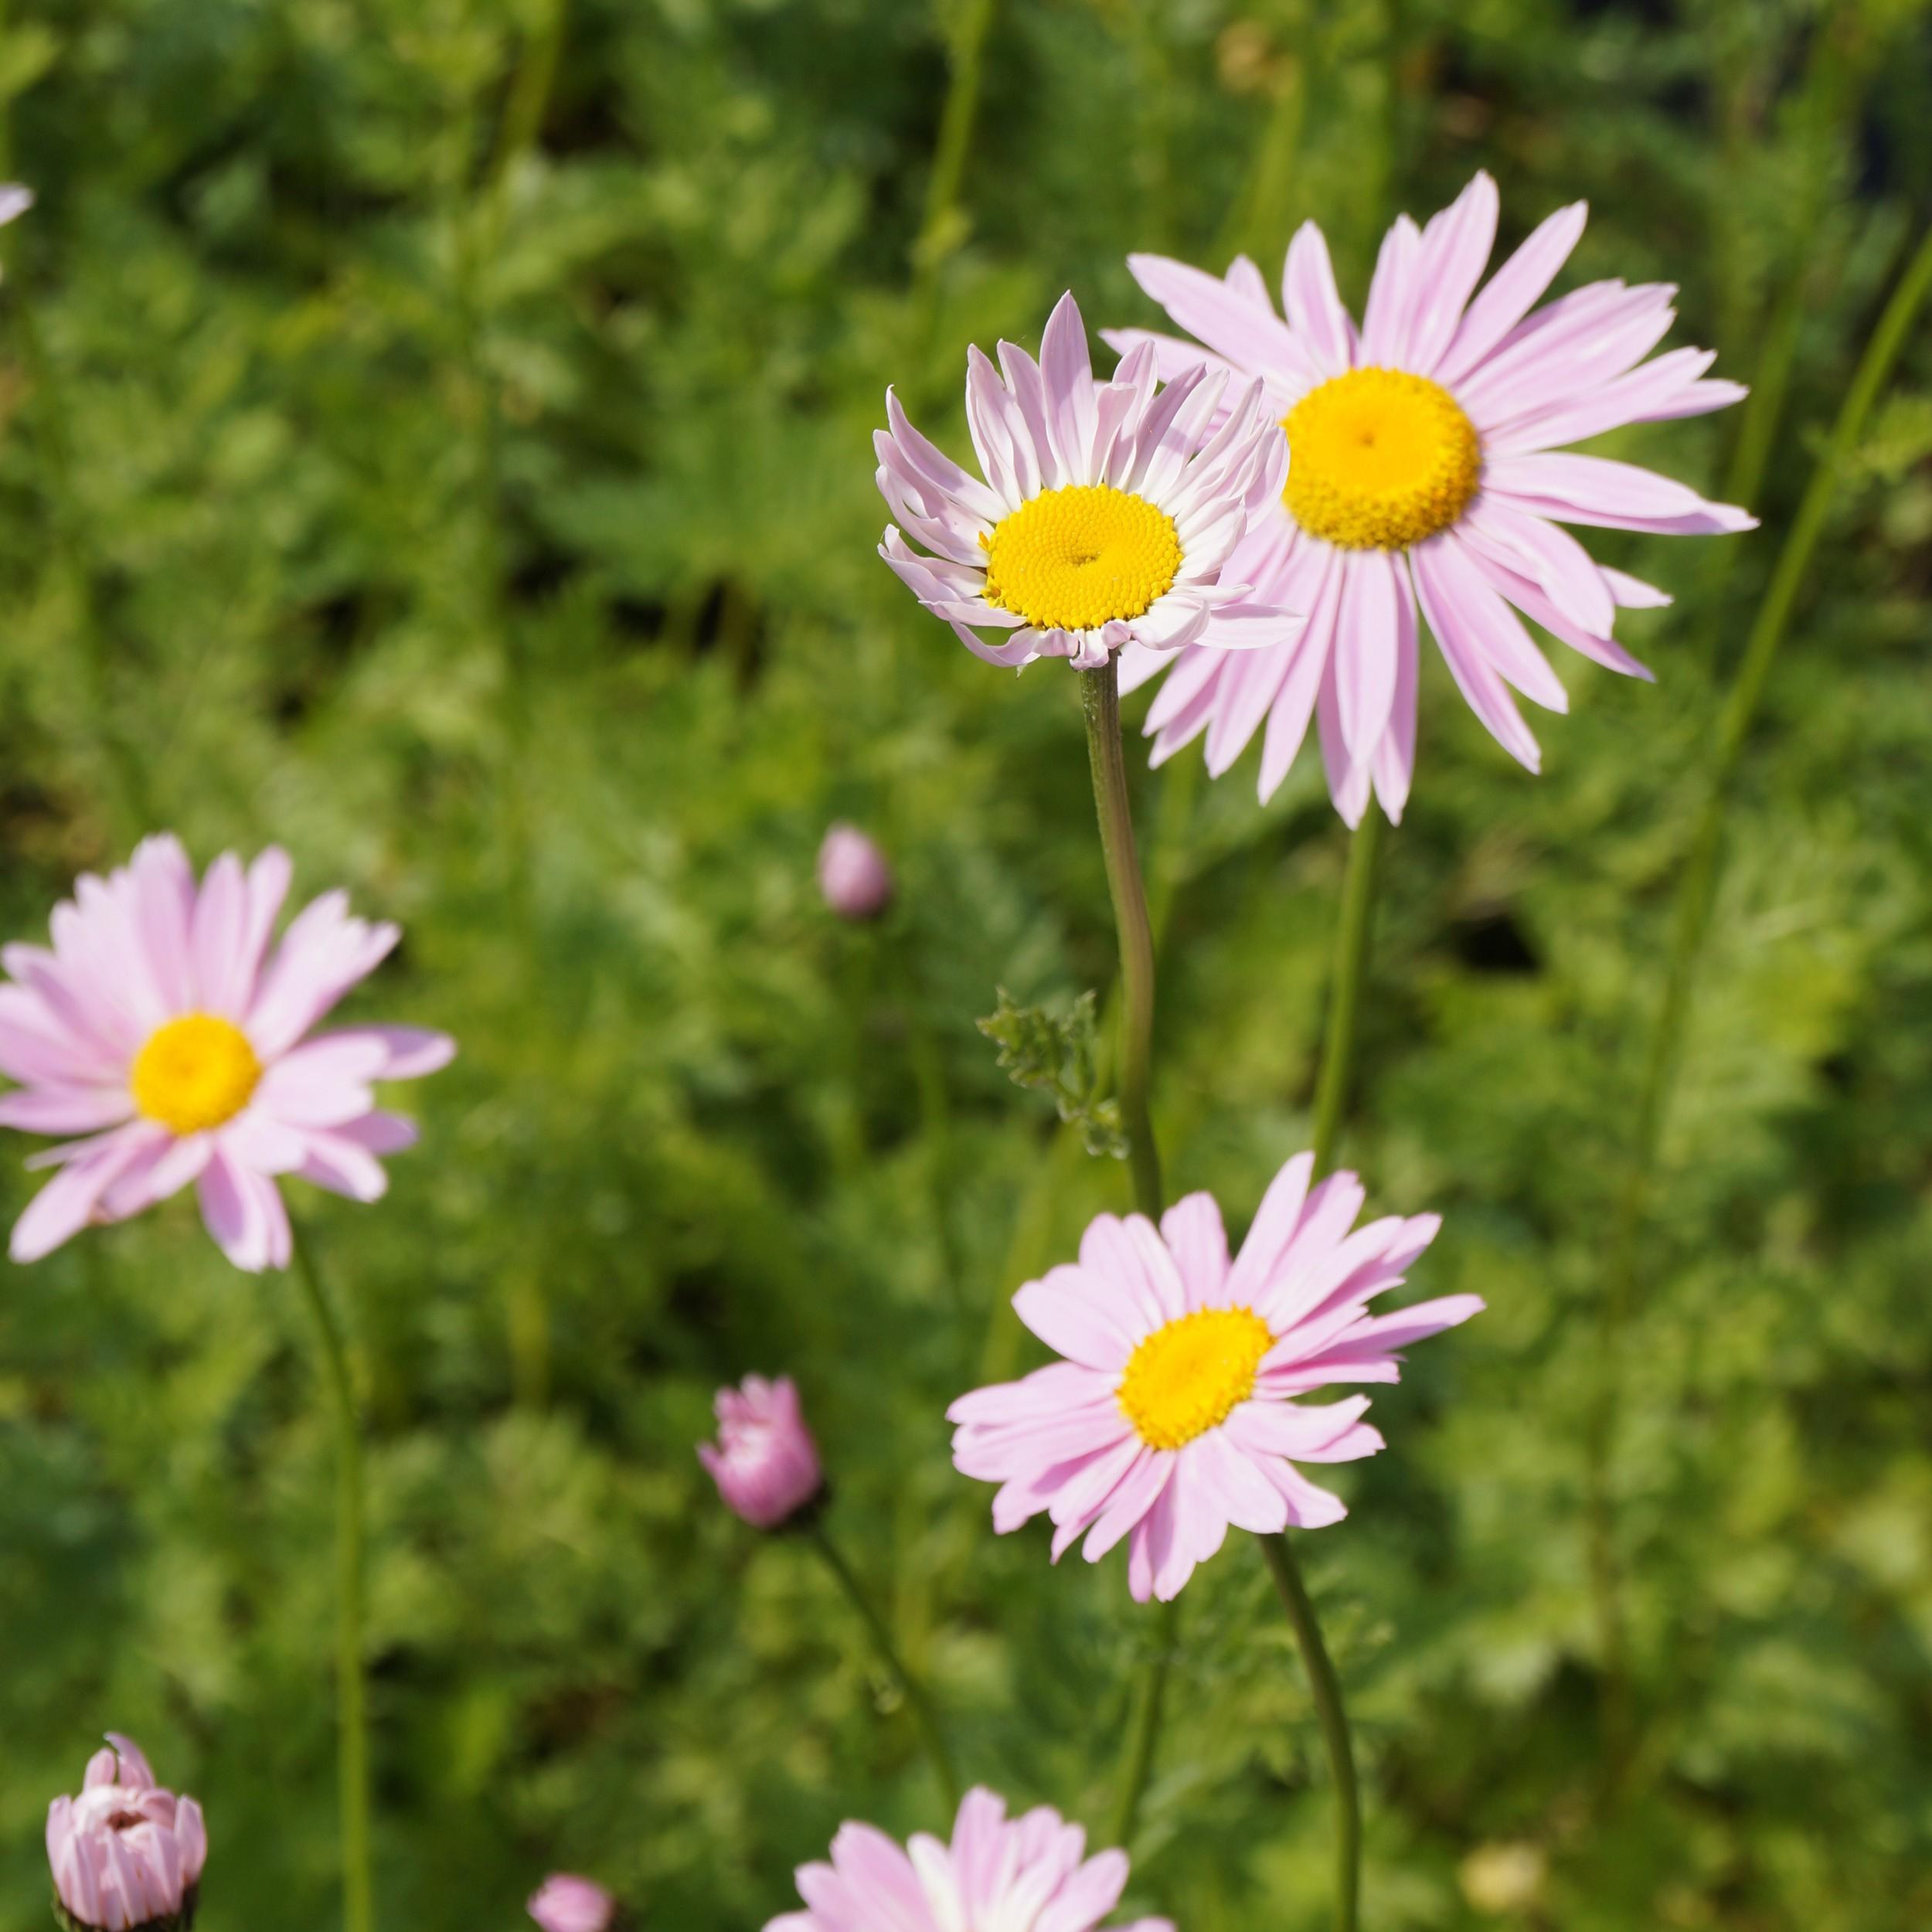 Super Chrysanthemum coccineum 'Robinsons Rosa' - Bunte Garten-Margerite @HQ_95